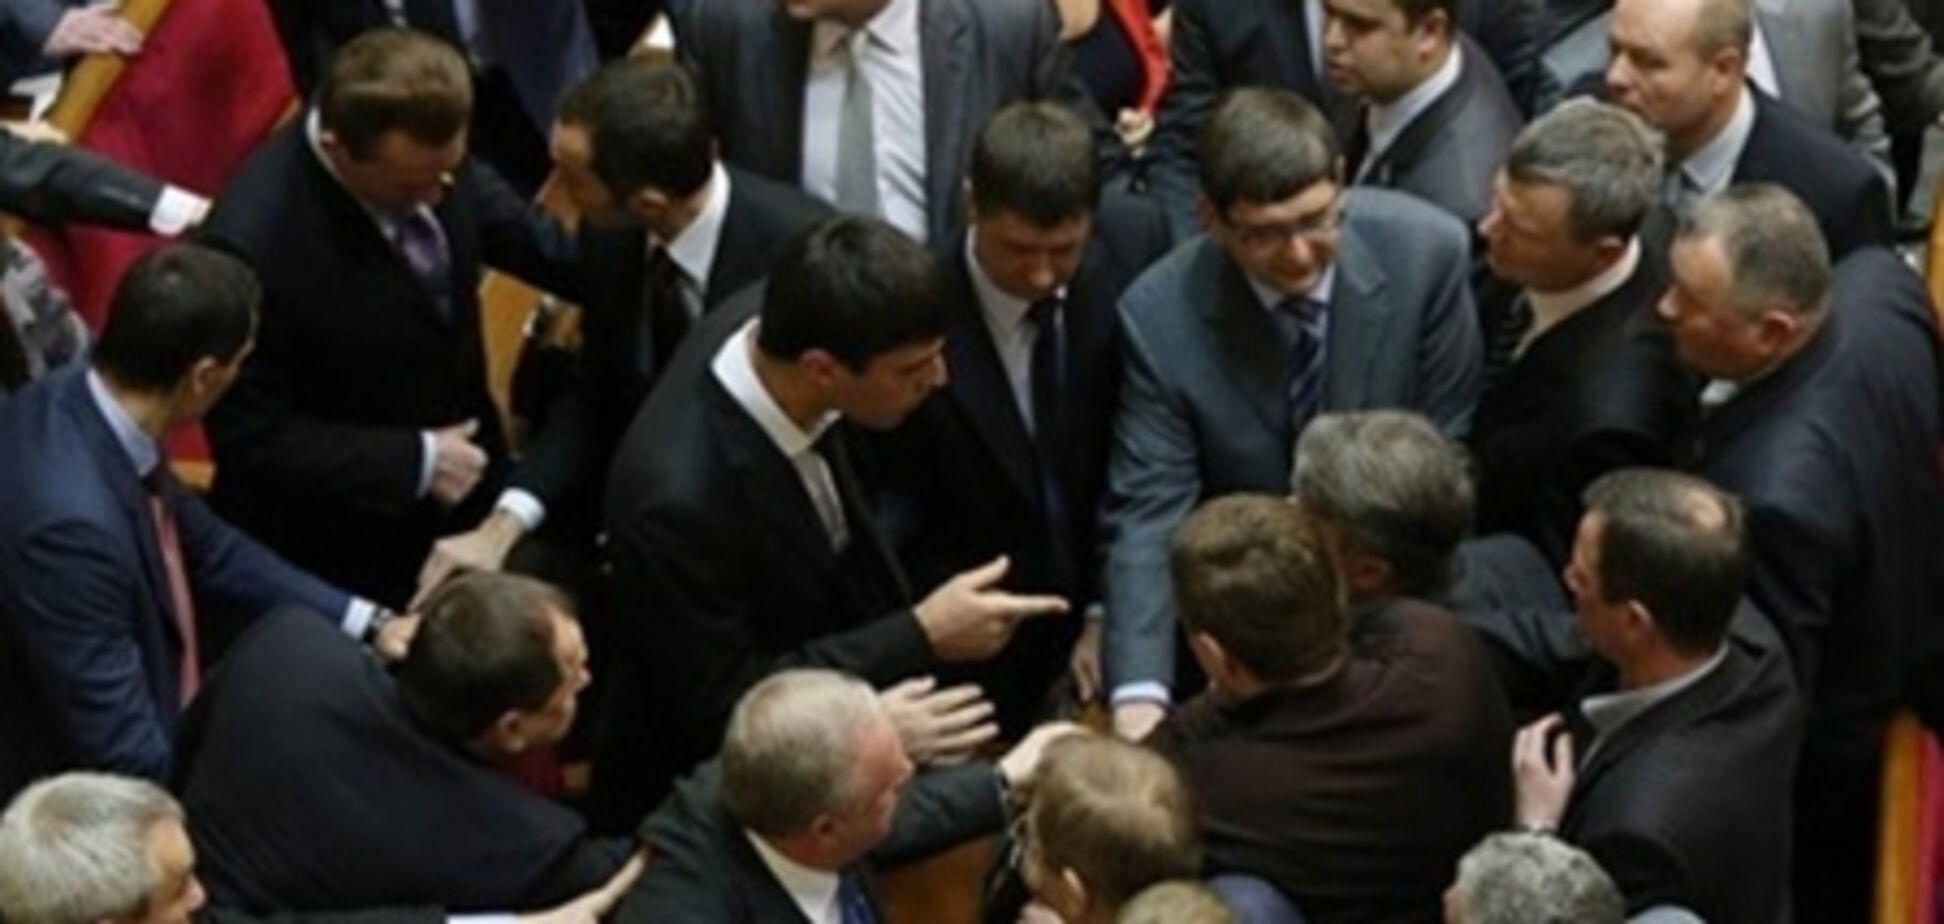 Политики и соцсети: от умиления до скандалов